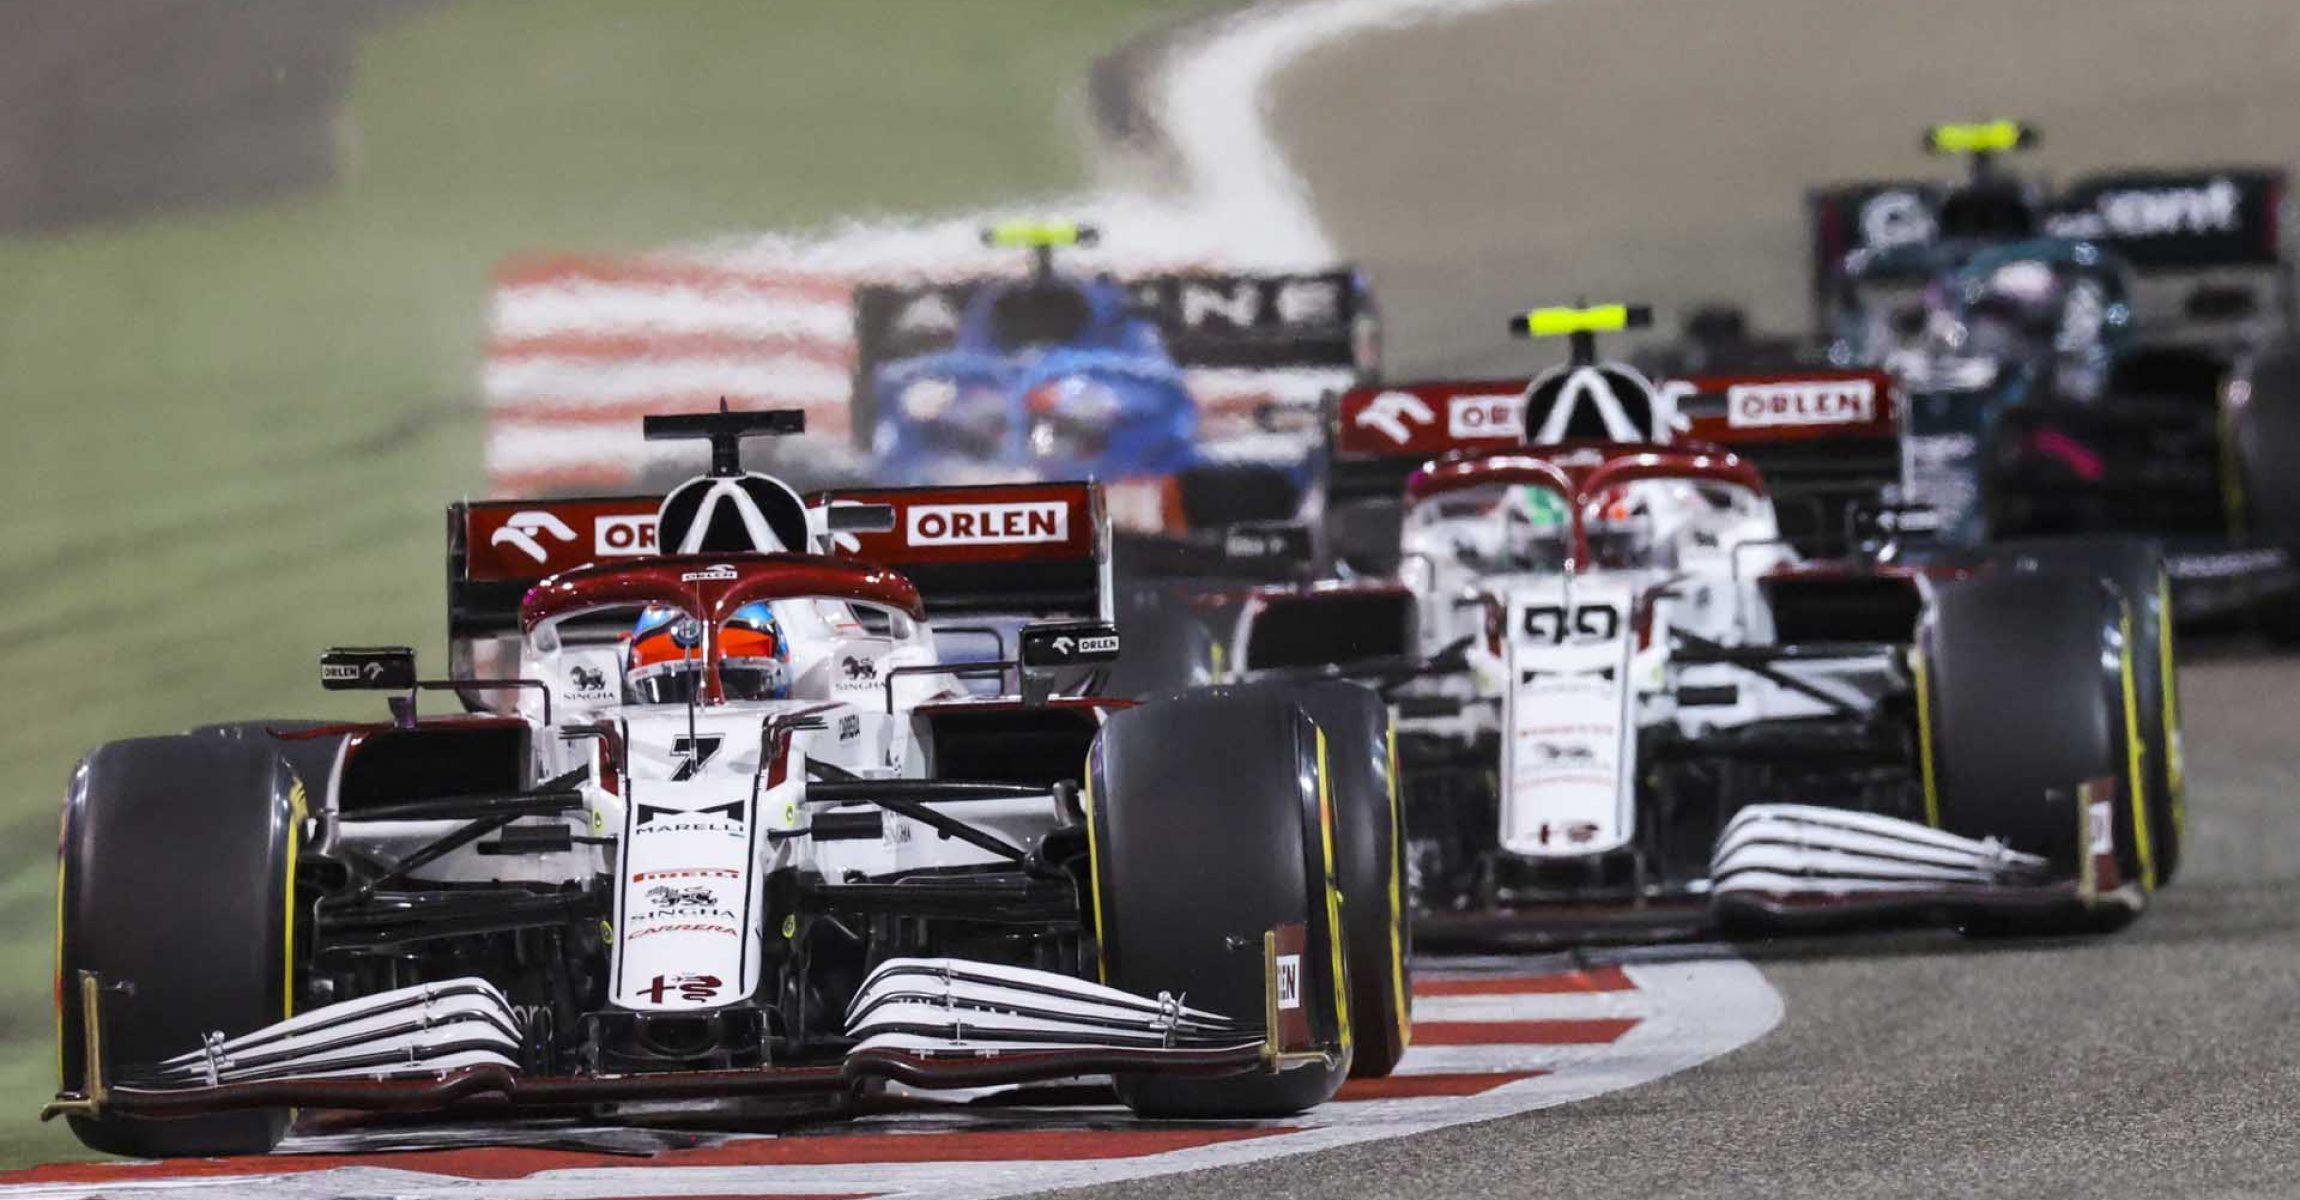 07 RAIKKONEN Kimi Räikkönen (fin), Alfa Romeo Racing ORLEN C41, action during Formula 1 Gulf Air Bahrain Grand Prix 2021 from March 26 to 28, 2021 on the Bahrain International Circuit, in Sakhir, Bahrain - Photo DPPI